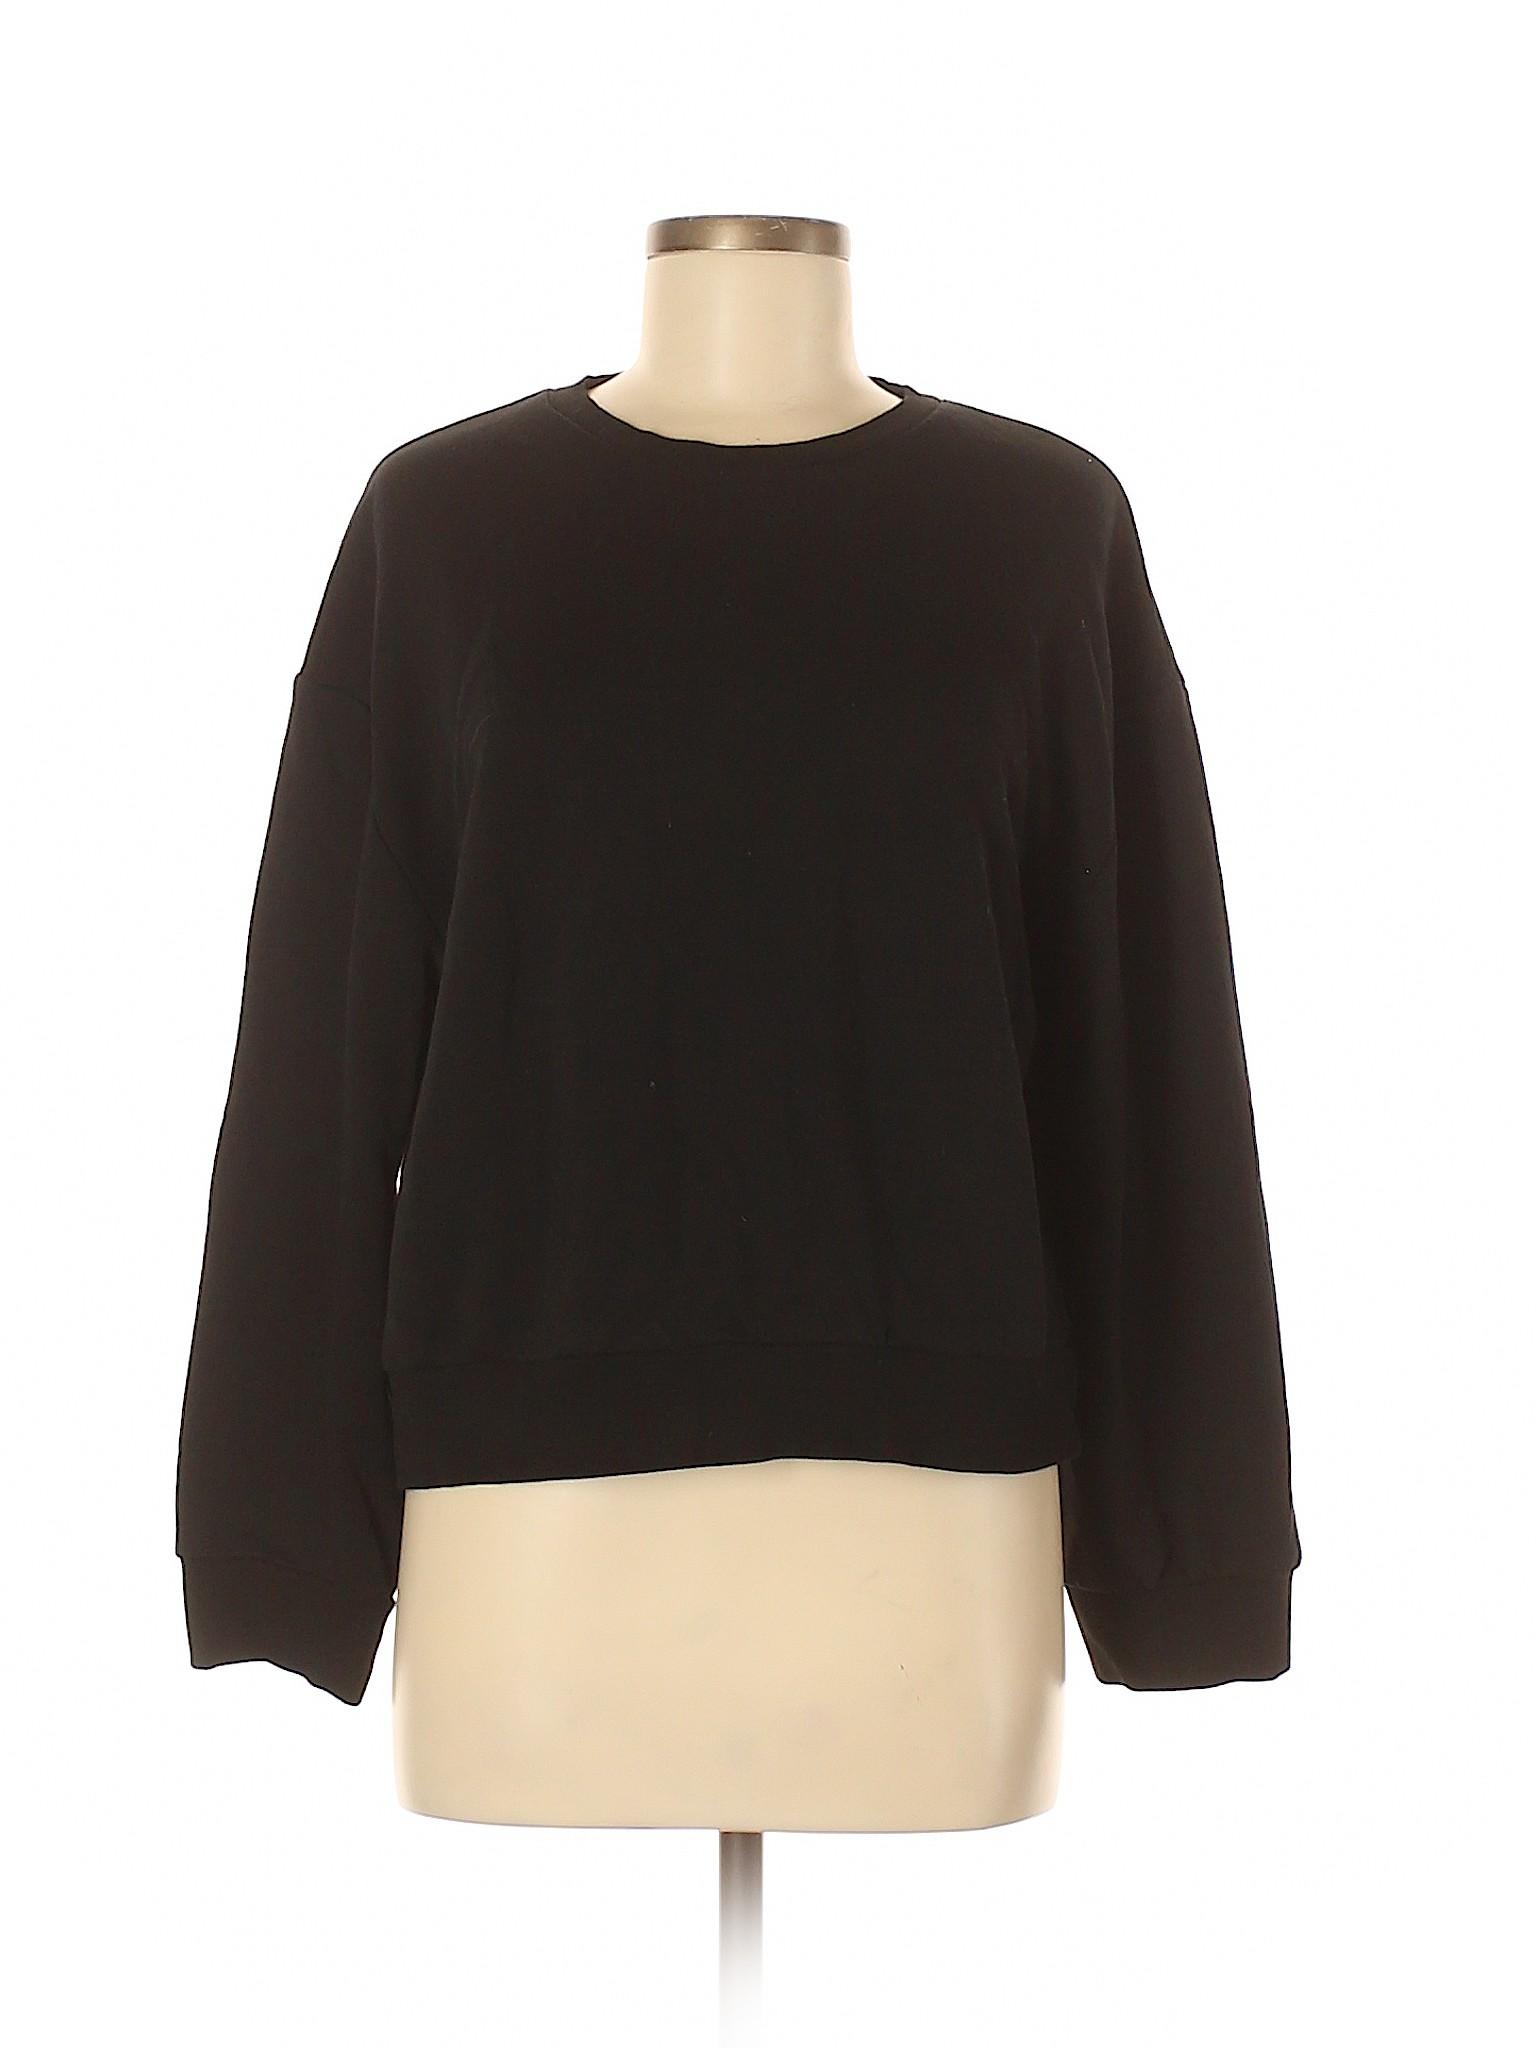 c81361e253 Details about Zara Trf Women Black Sweatshirt Med